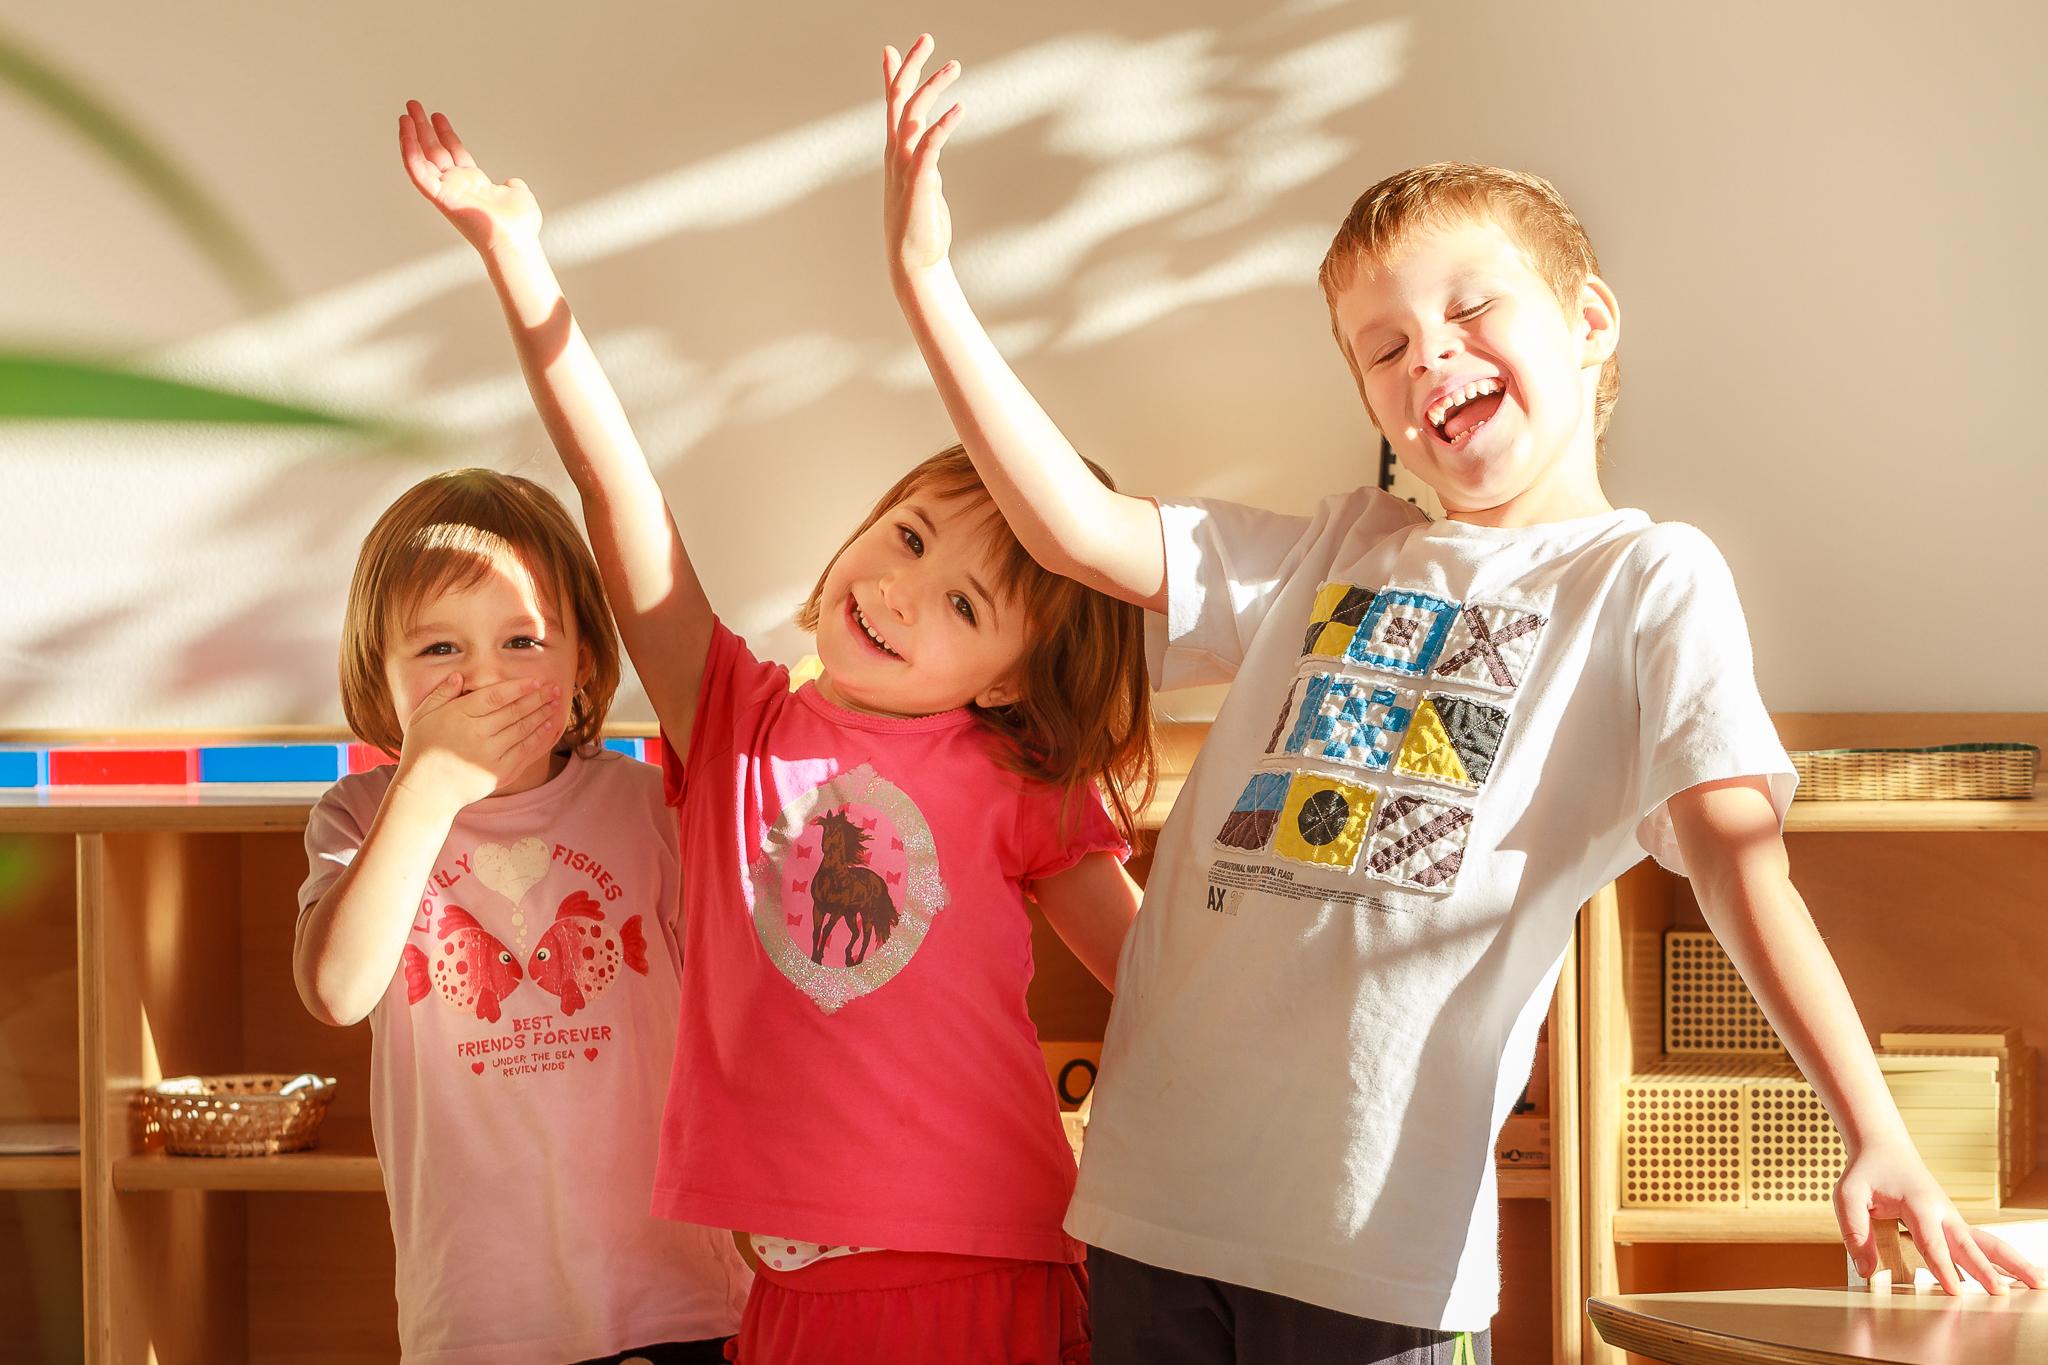 The children of NestLingue preschool